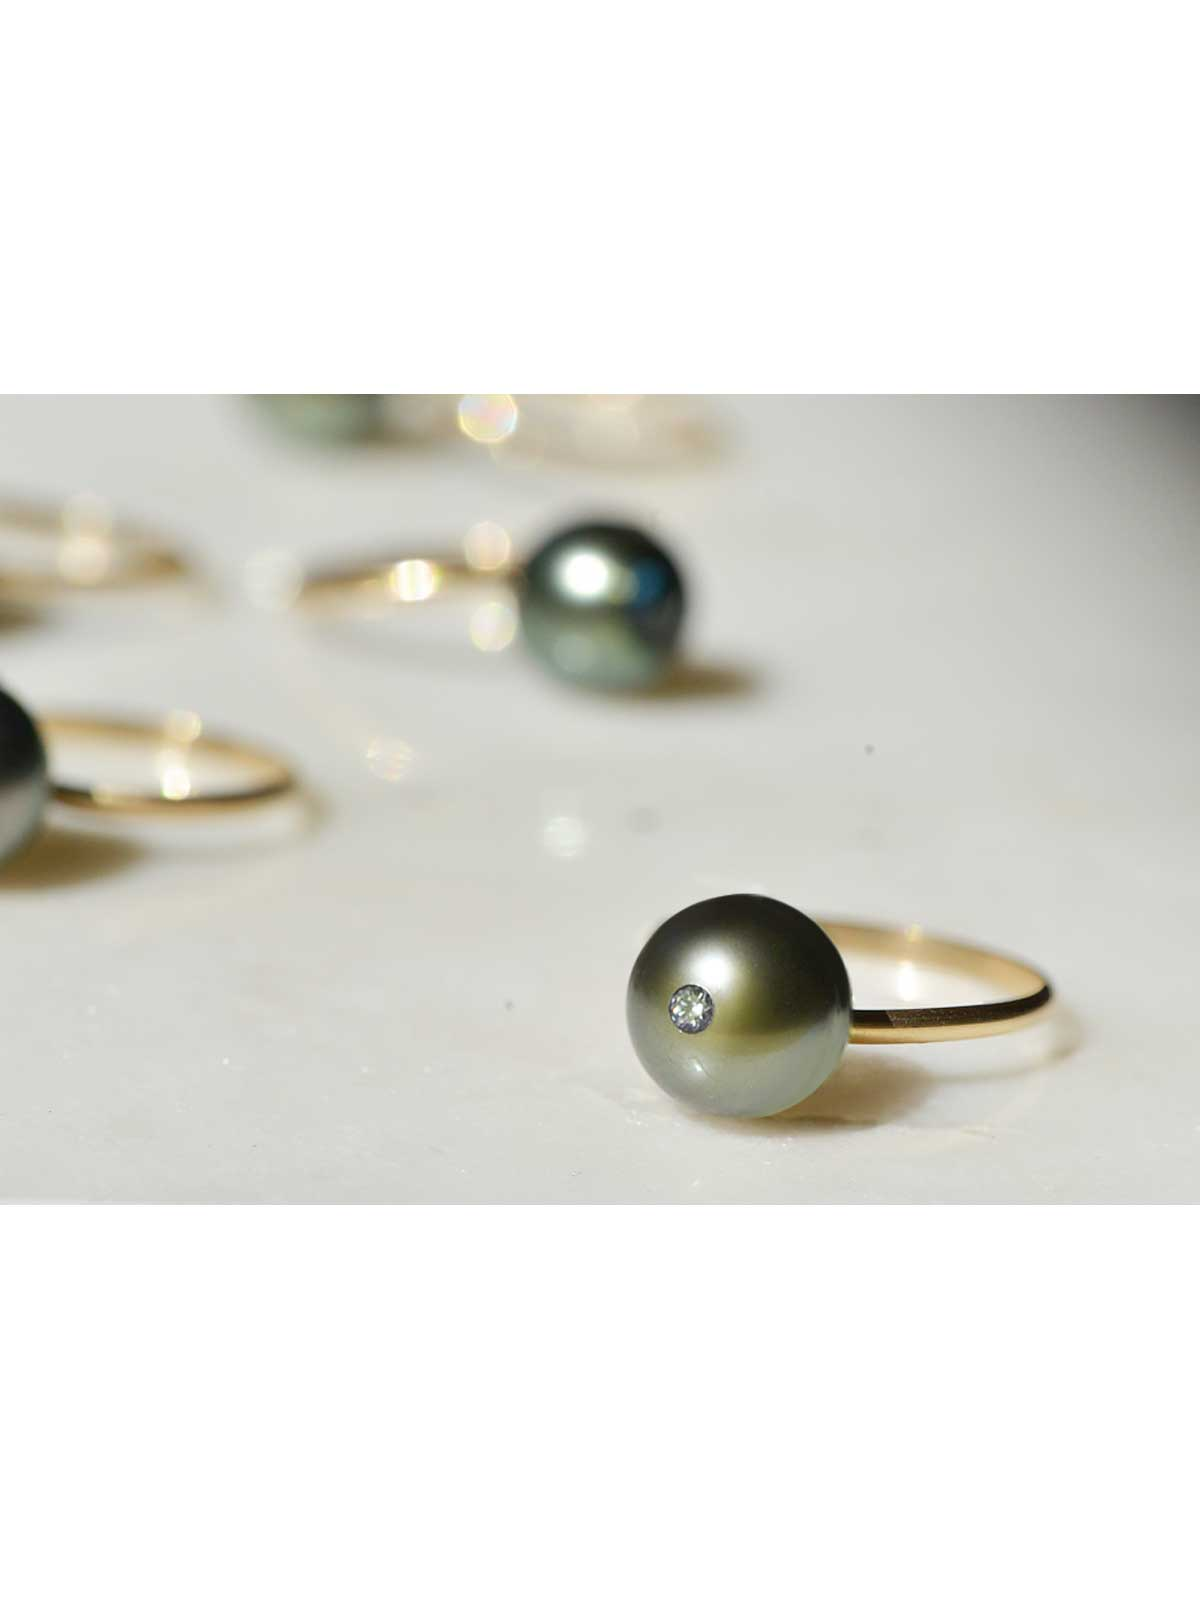 ETERNITY RING Tahitian Baroque Pearl, White Diamond 14K yellow gold